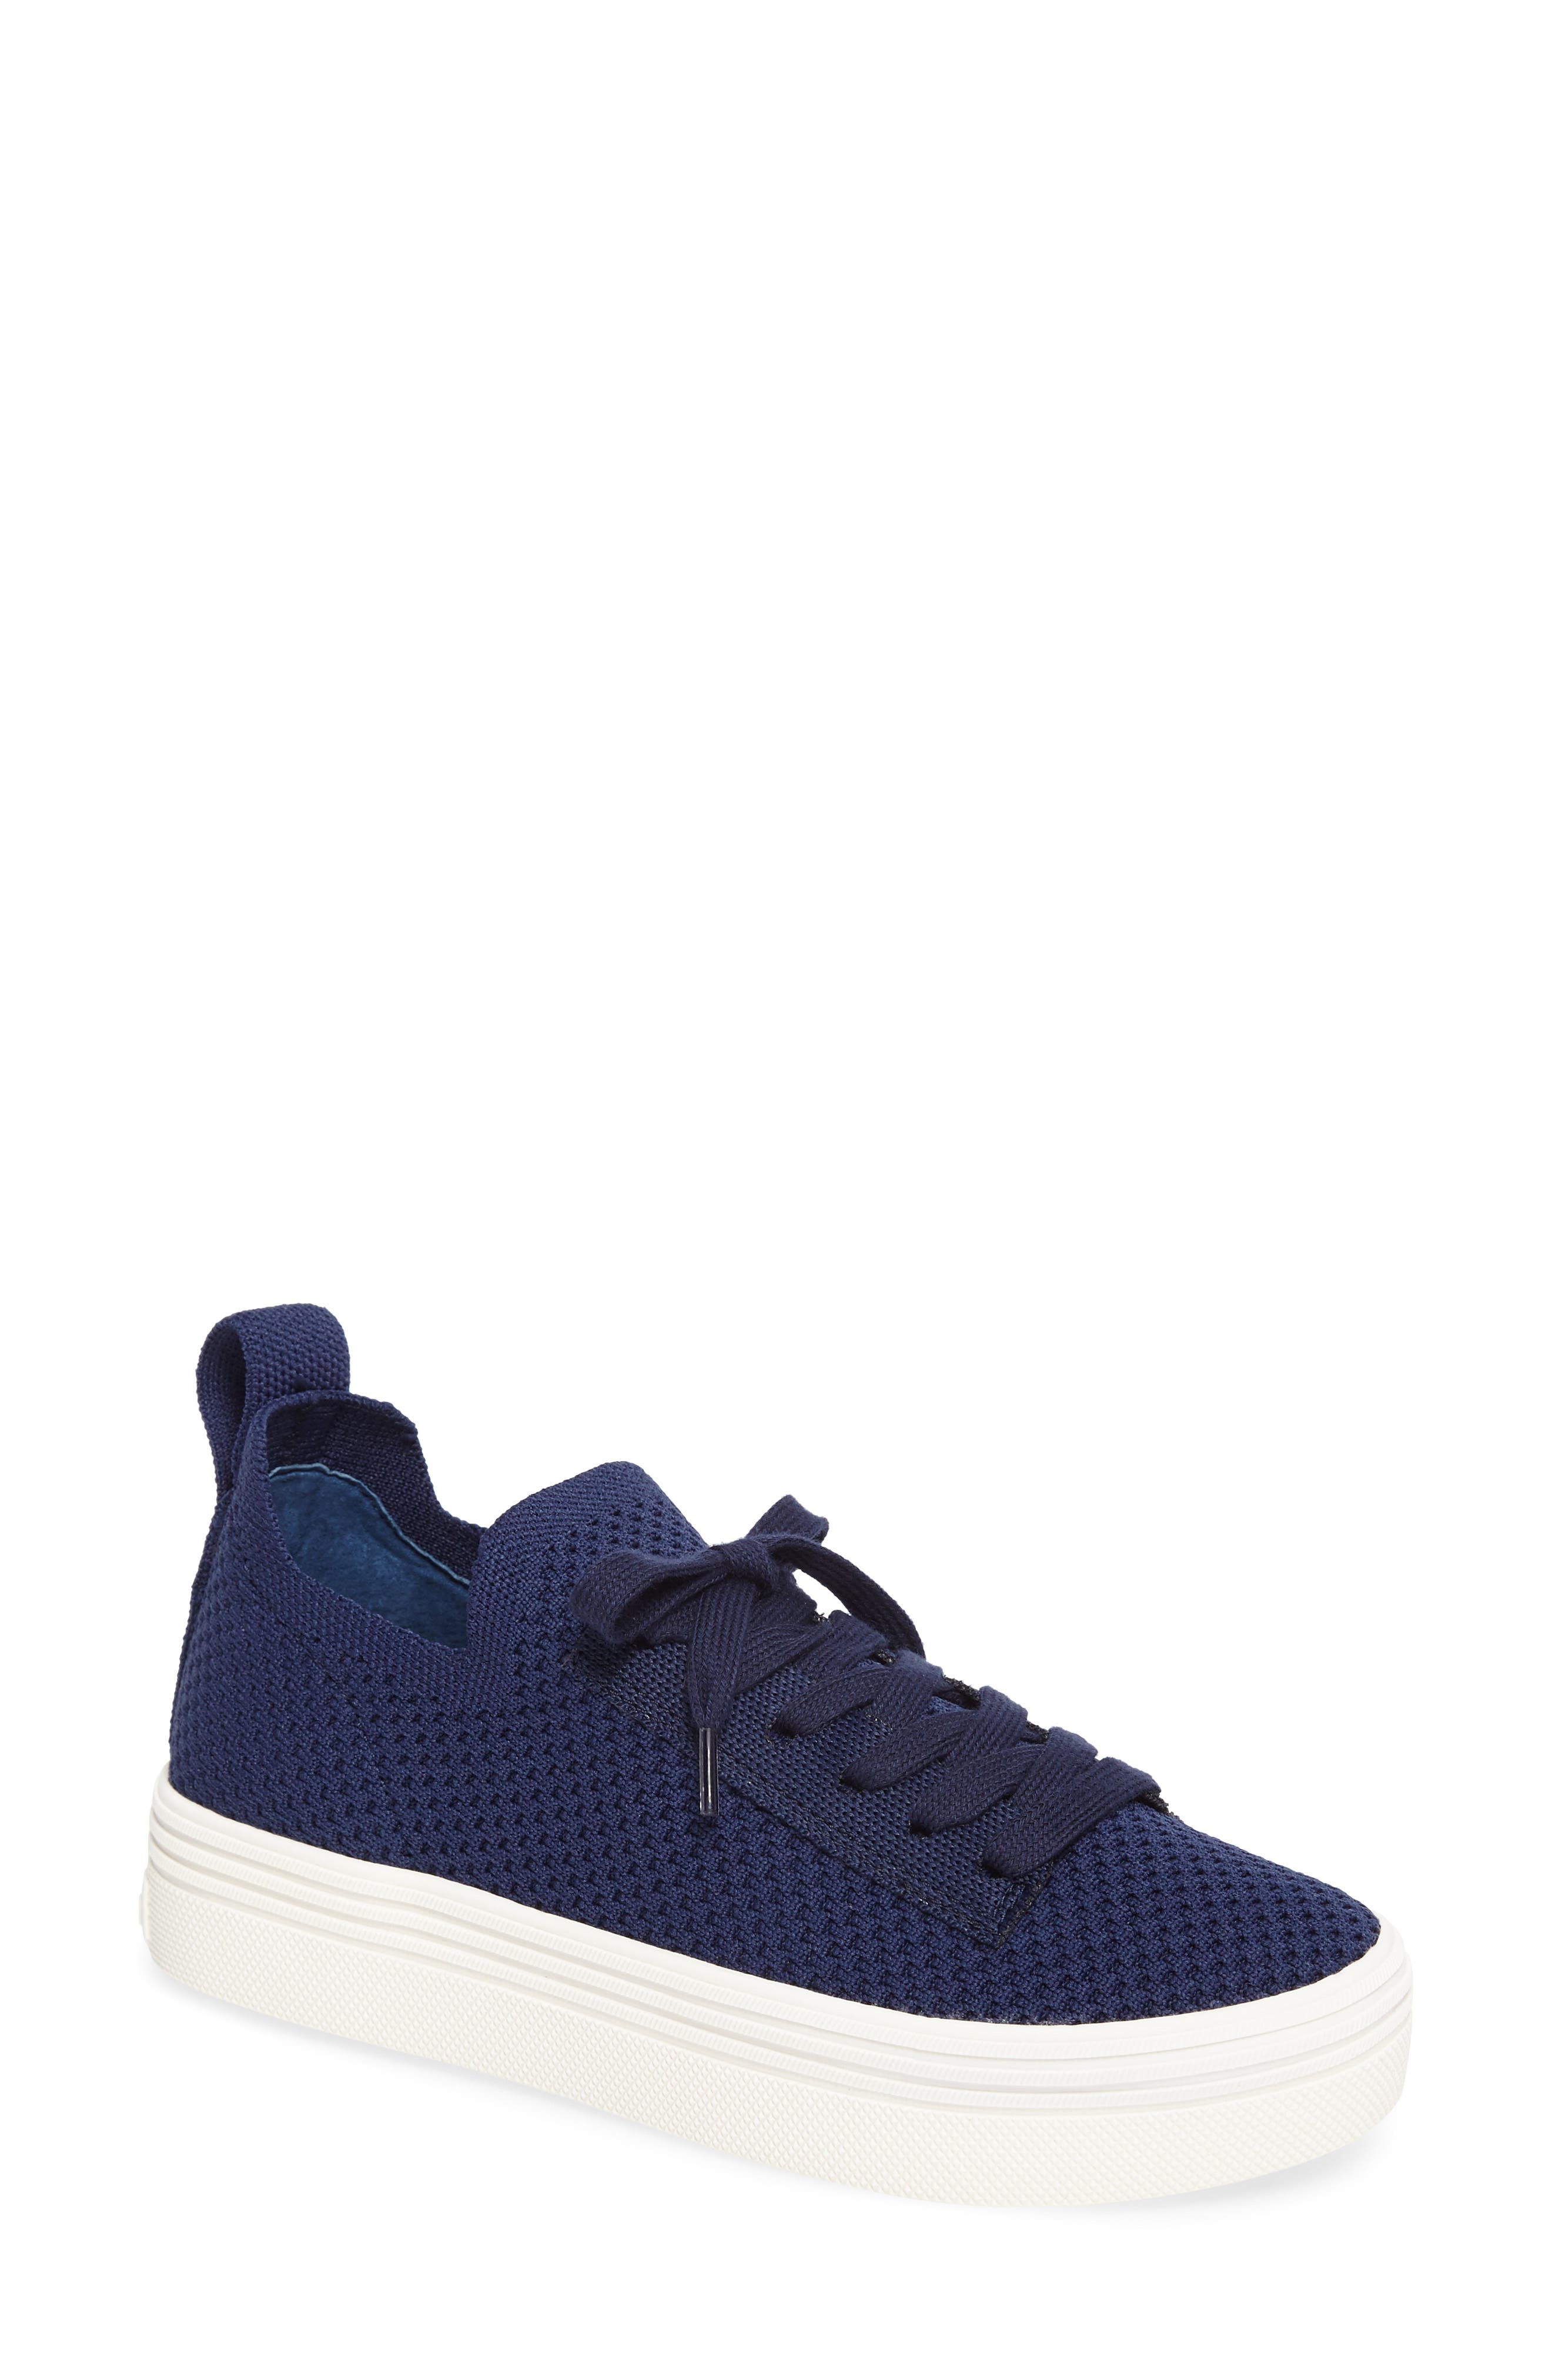 DOLCE VITA Tatum Knit Platform Sneaker